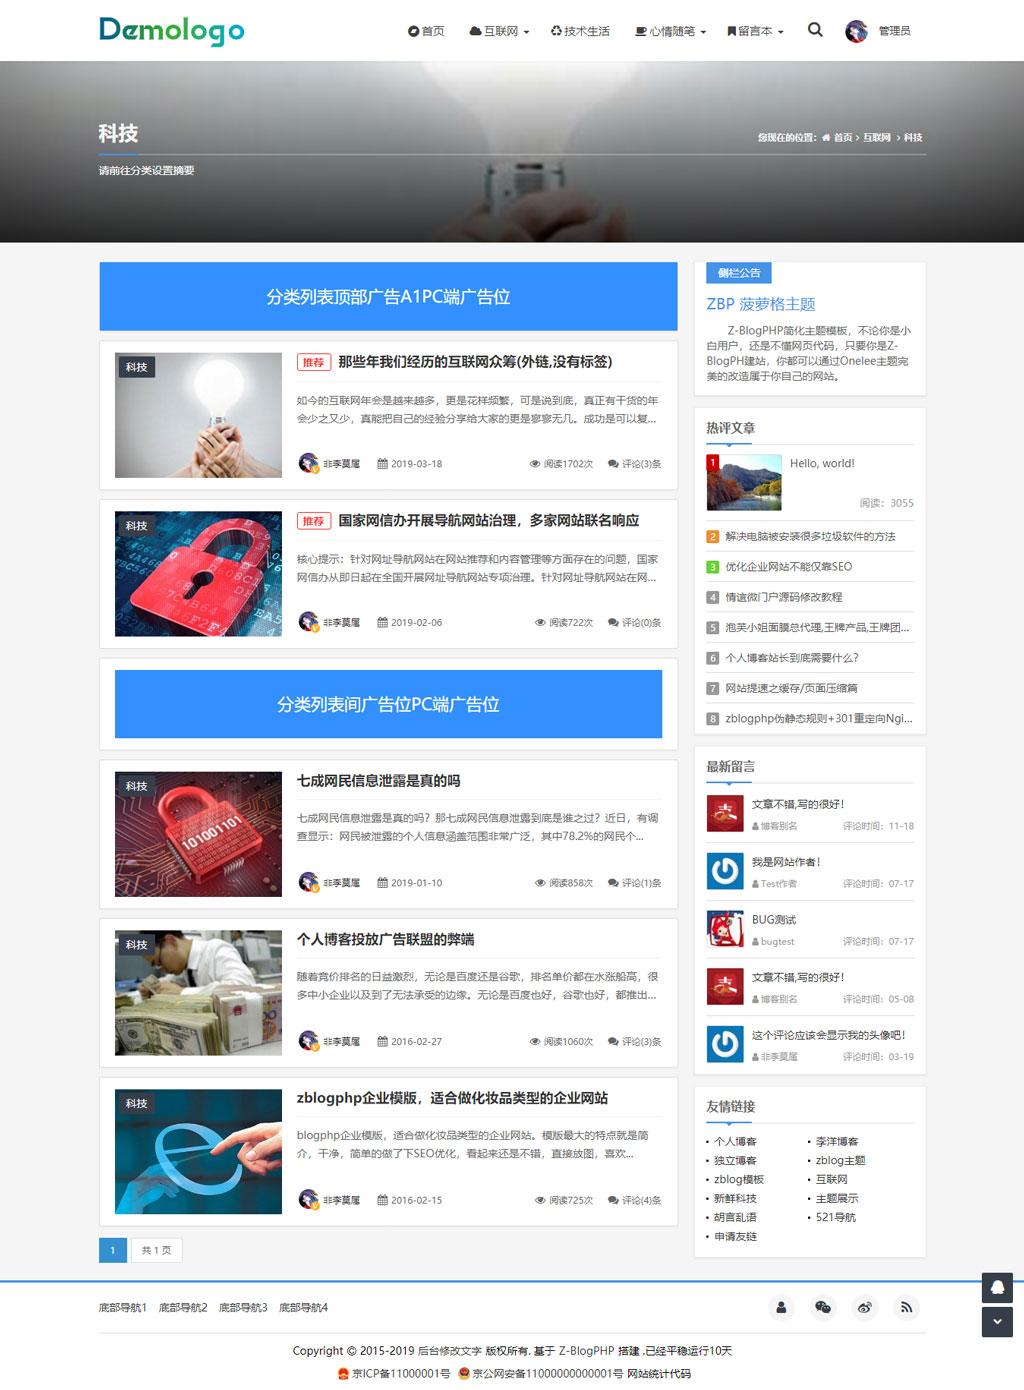 Z-blogPHP《小清新》至简至美个人博客主题模板,自适应加SEO优化 第8张